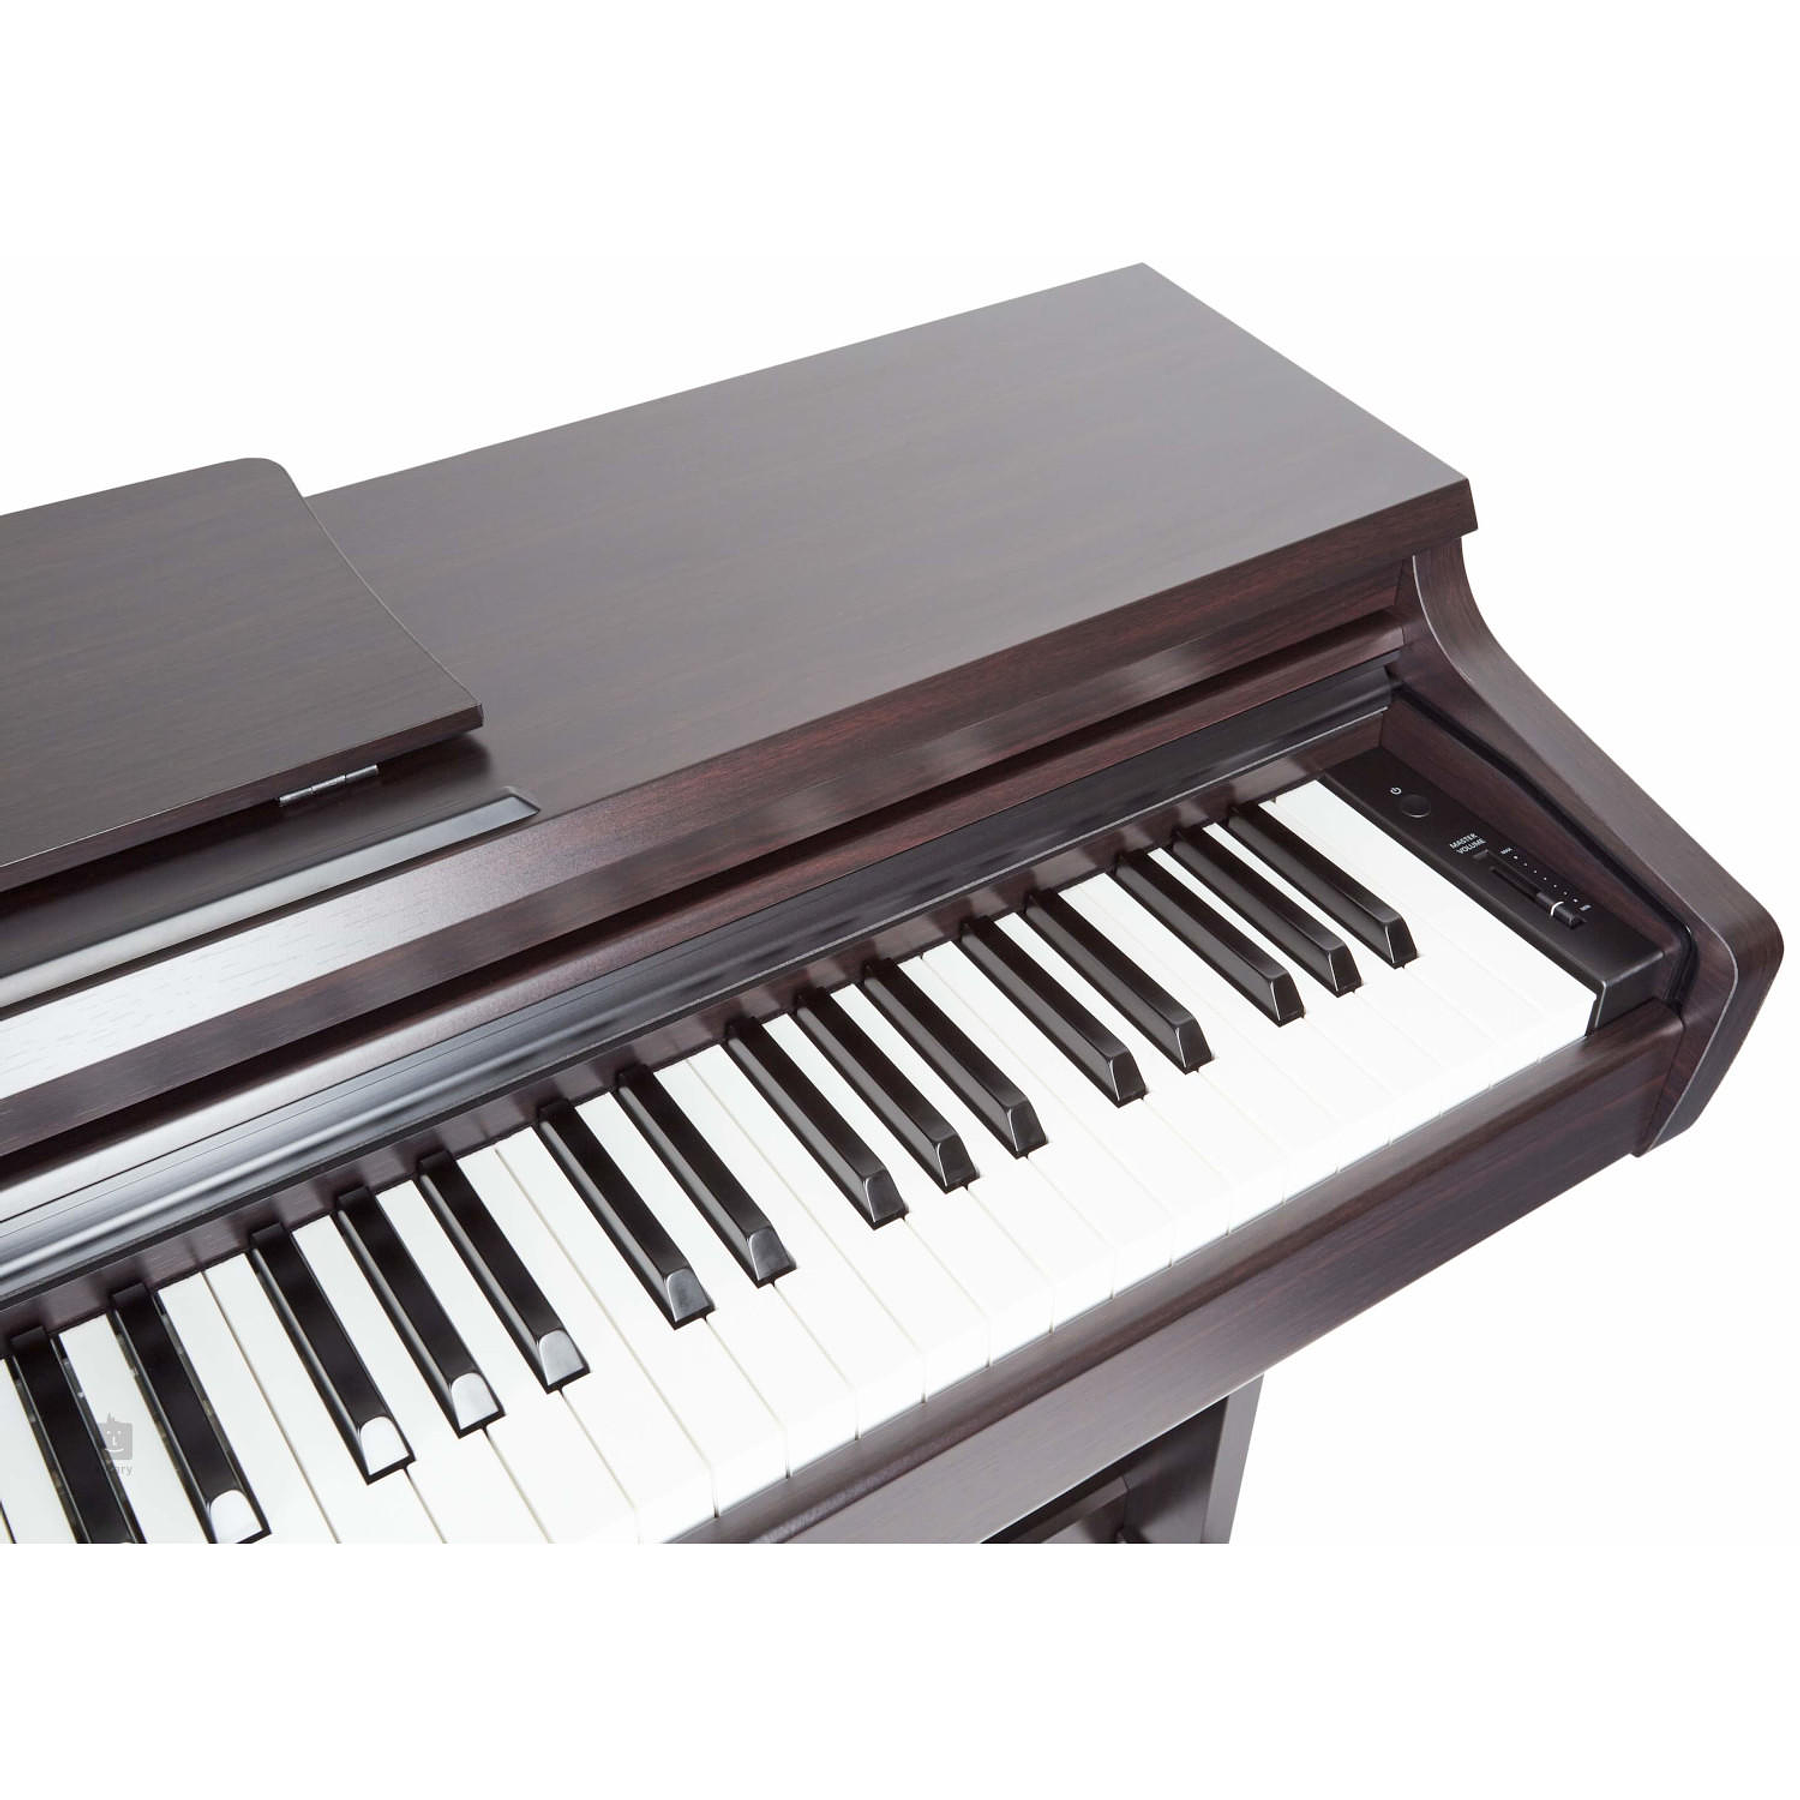 Piano Digital Kawai KDP120R